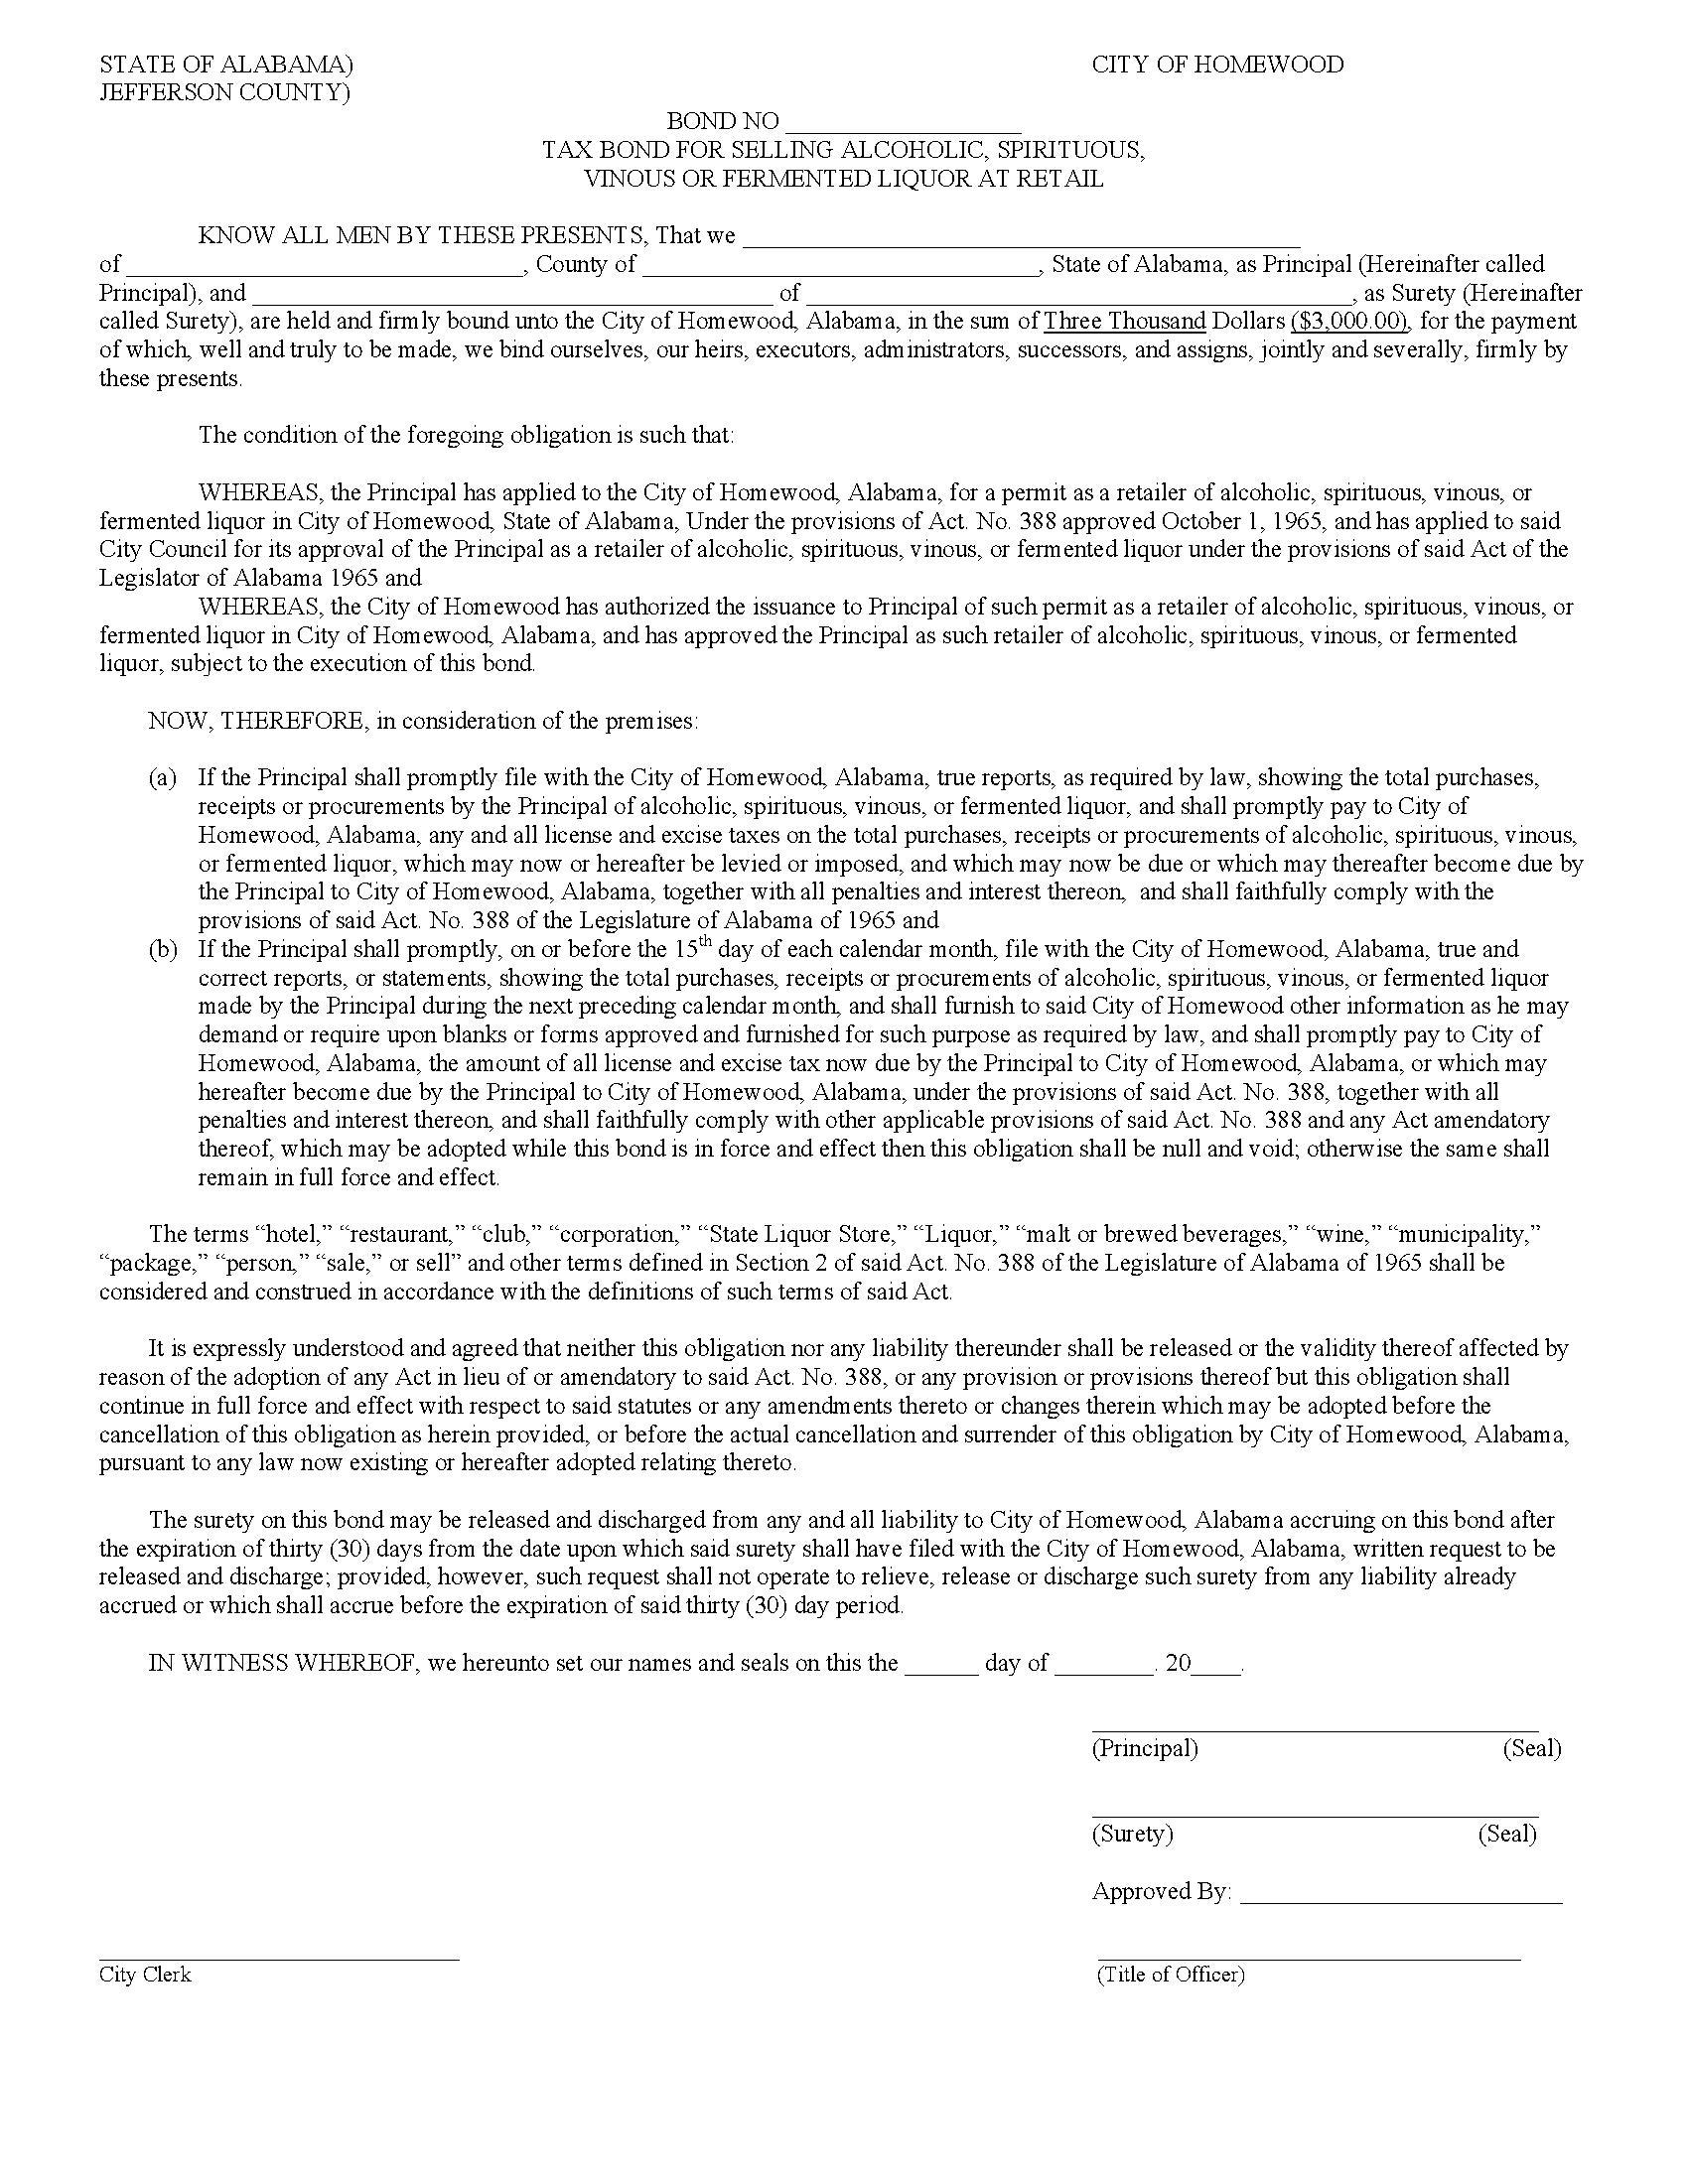 City of Homewood Homewood - City Retail Liquor Tax sample image